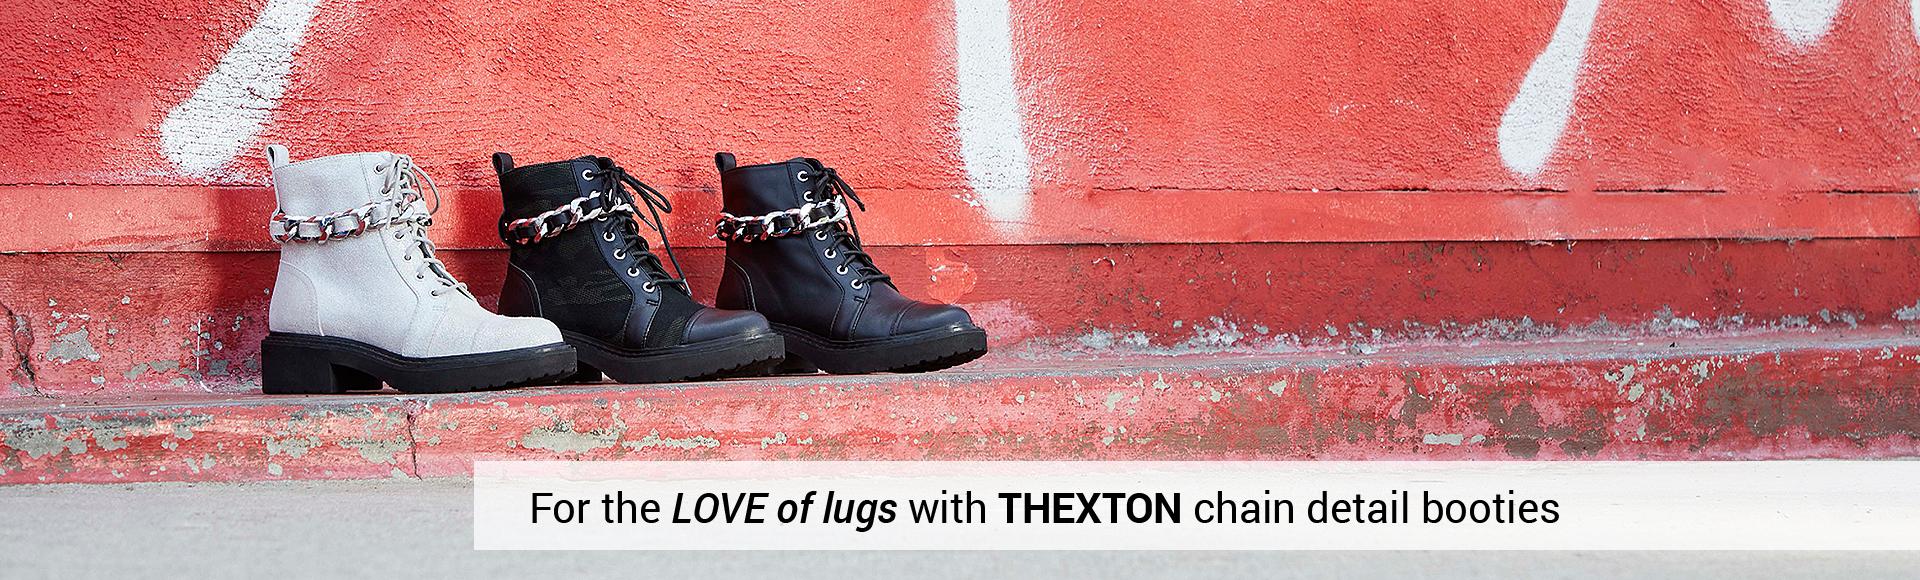 THEXTON lug sole chain detail combat booties